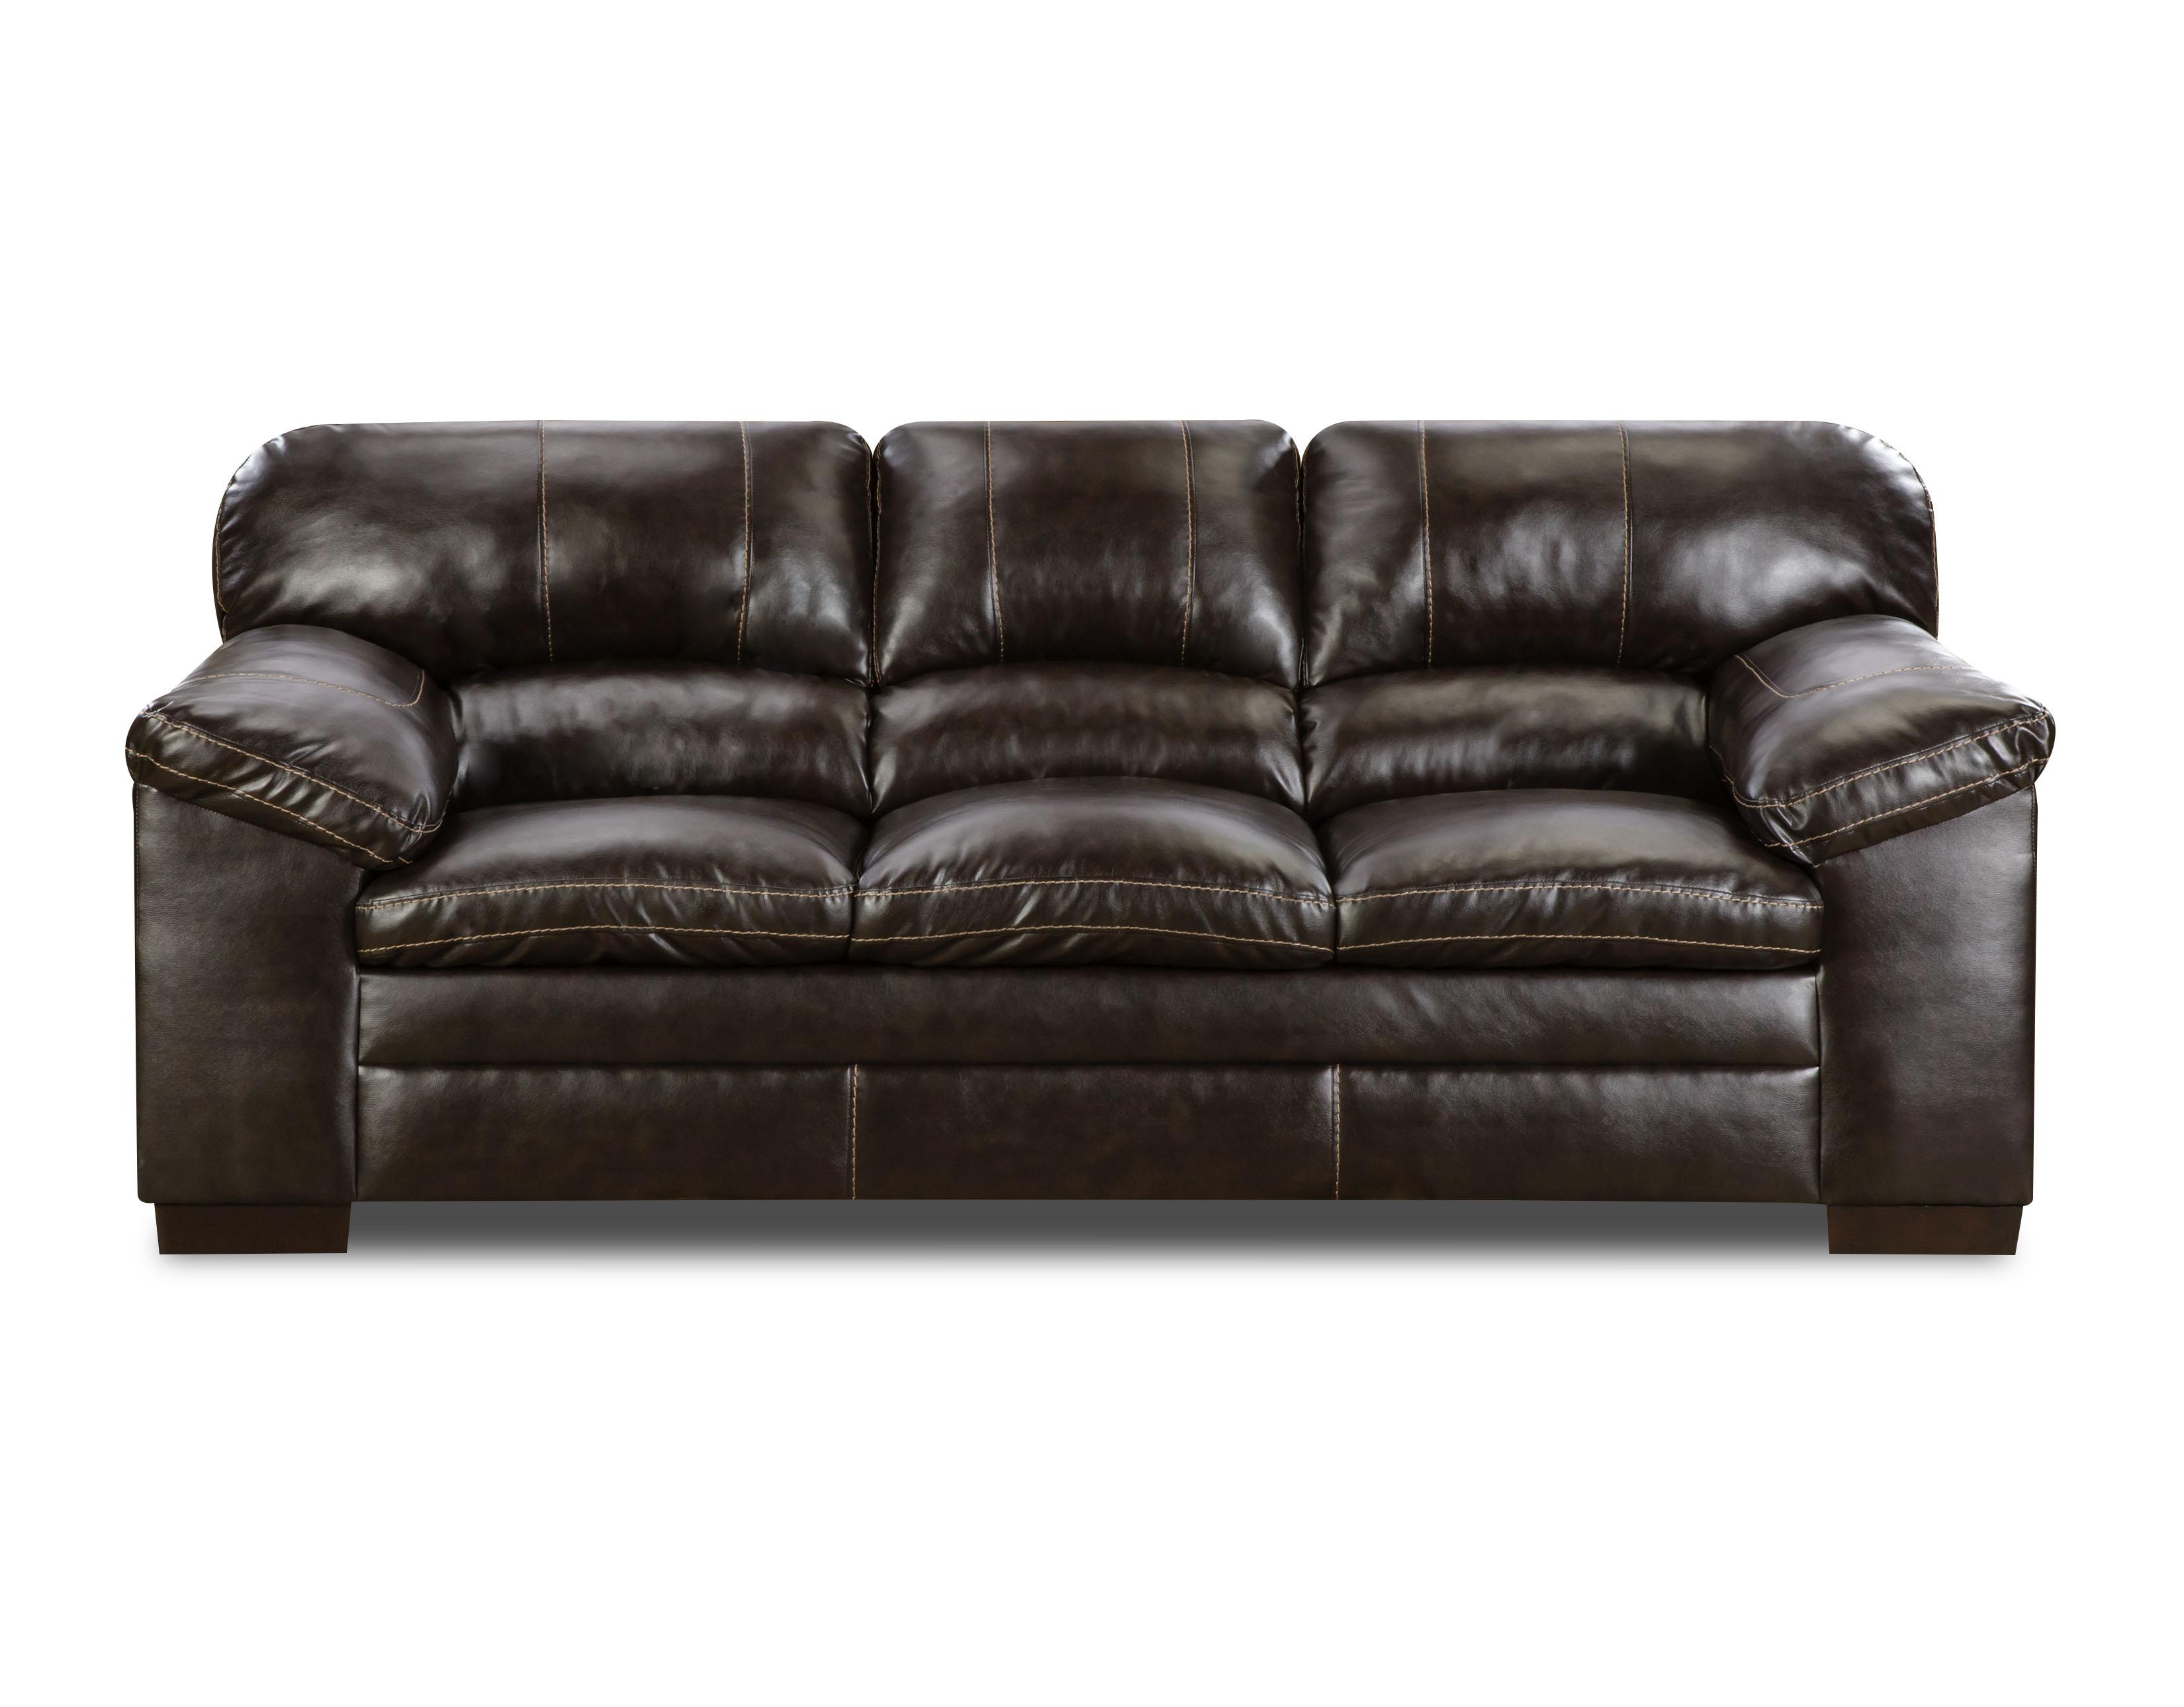 Simmons Dylan Faux Leather Sofa  Bingo Brown